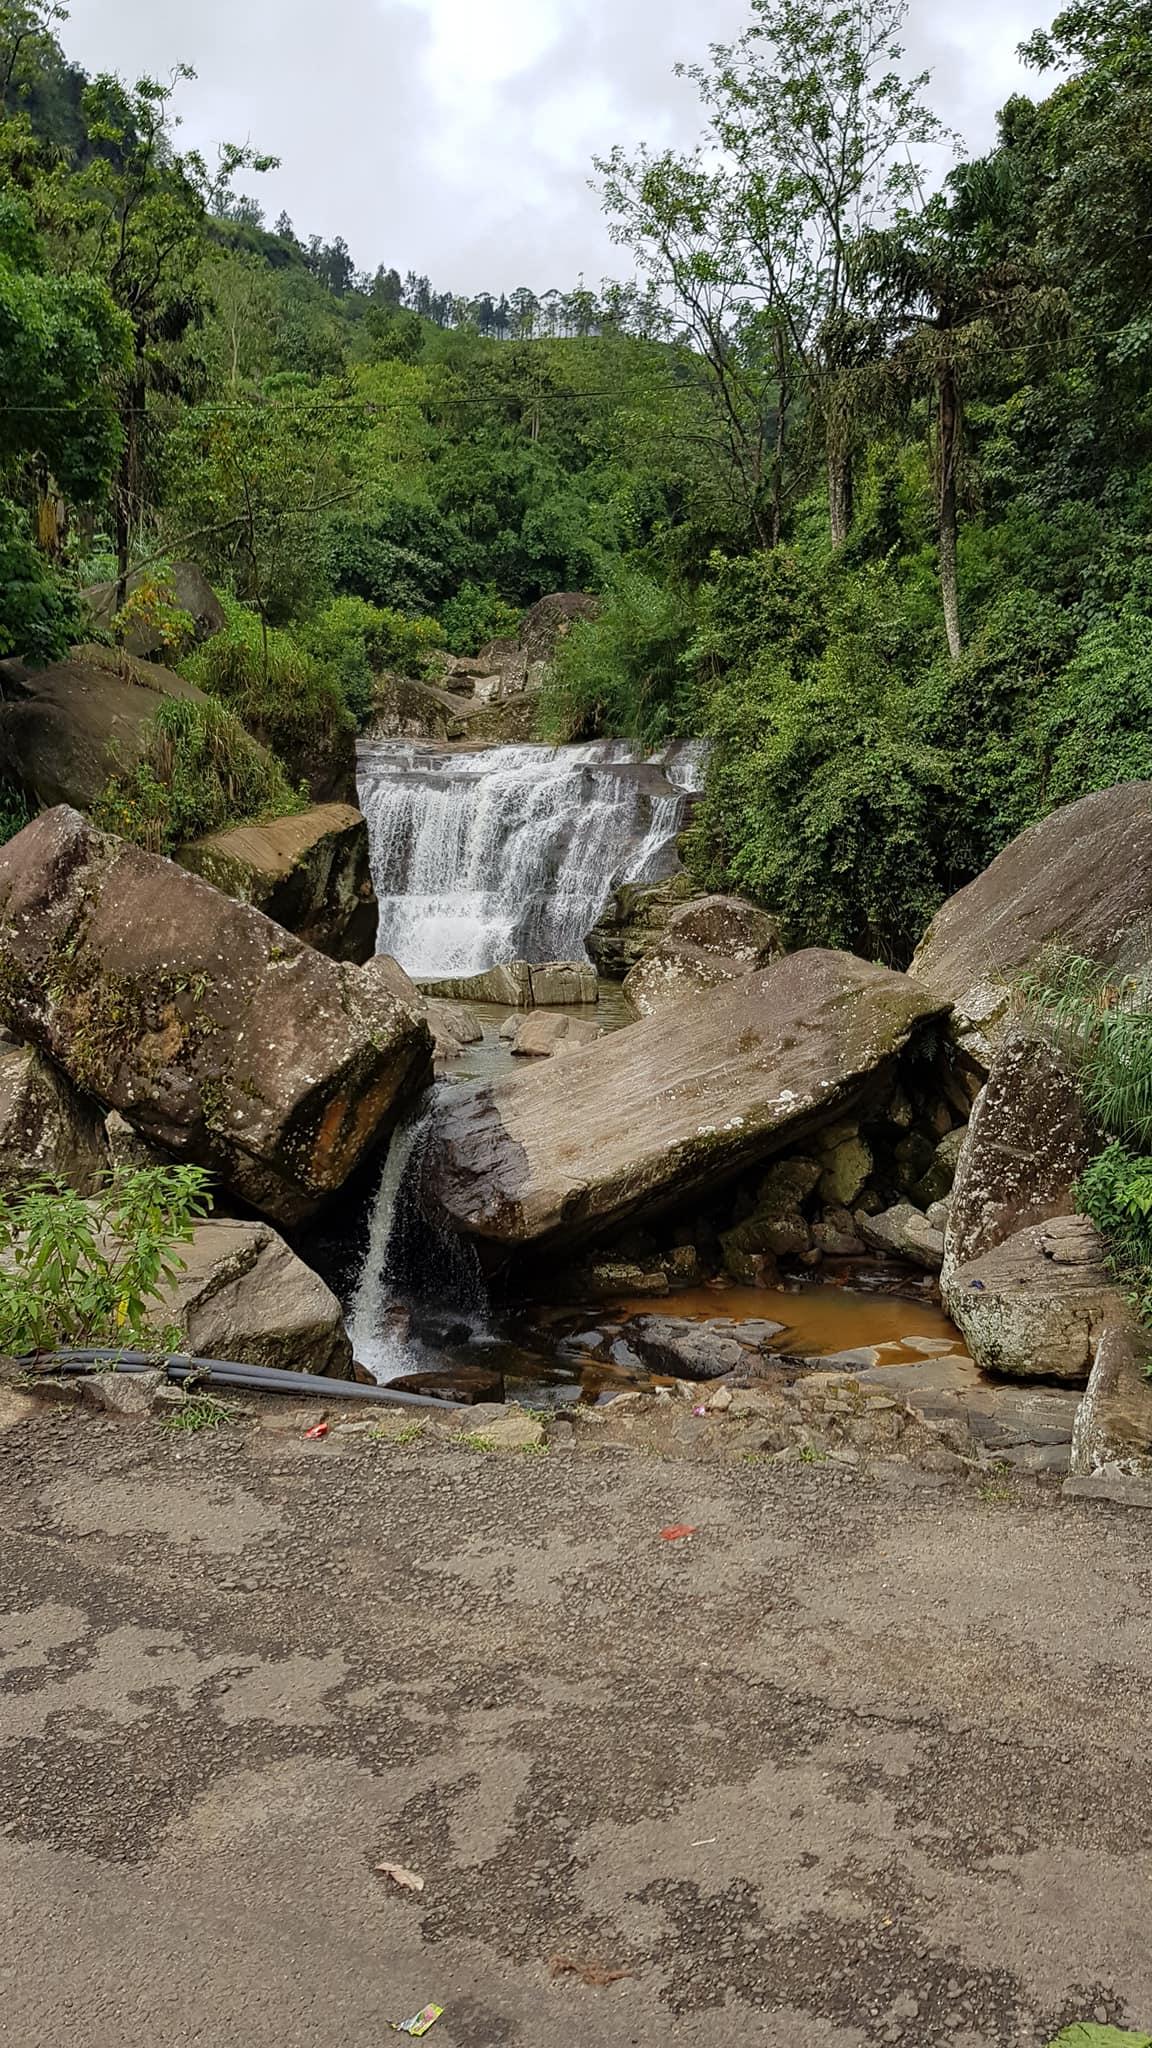 invite-to-paradise-sri-lanka-maldives-holiday-honeymoon-specialists-customer-guest-feedback-zane-lisa-butcher-tea-plantation-ella-waterfall.jpg